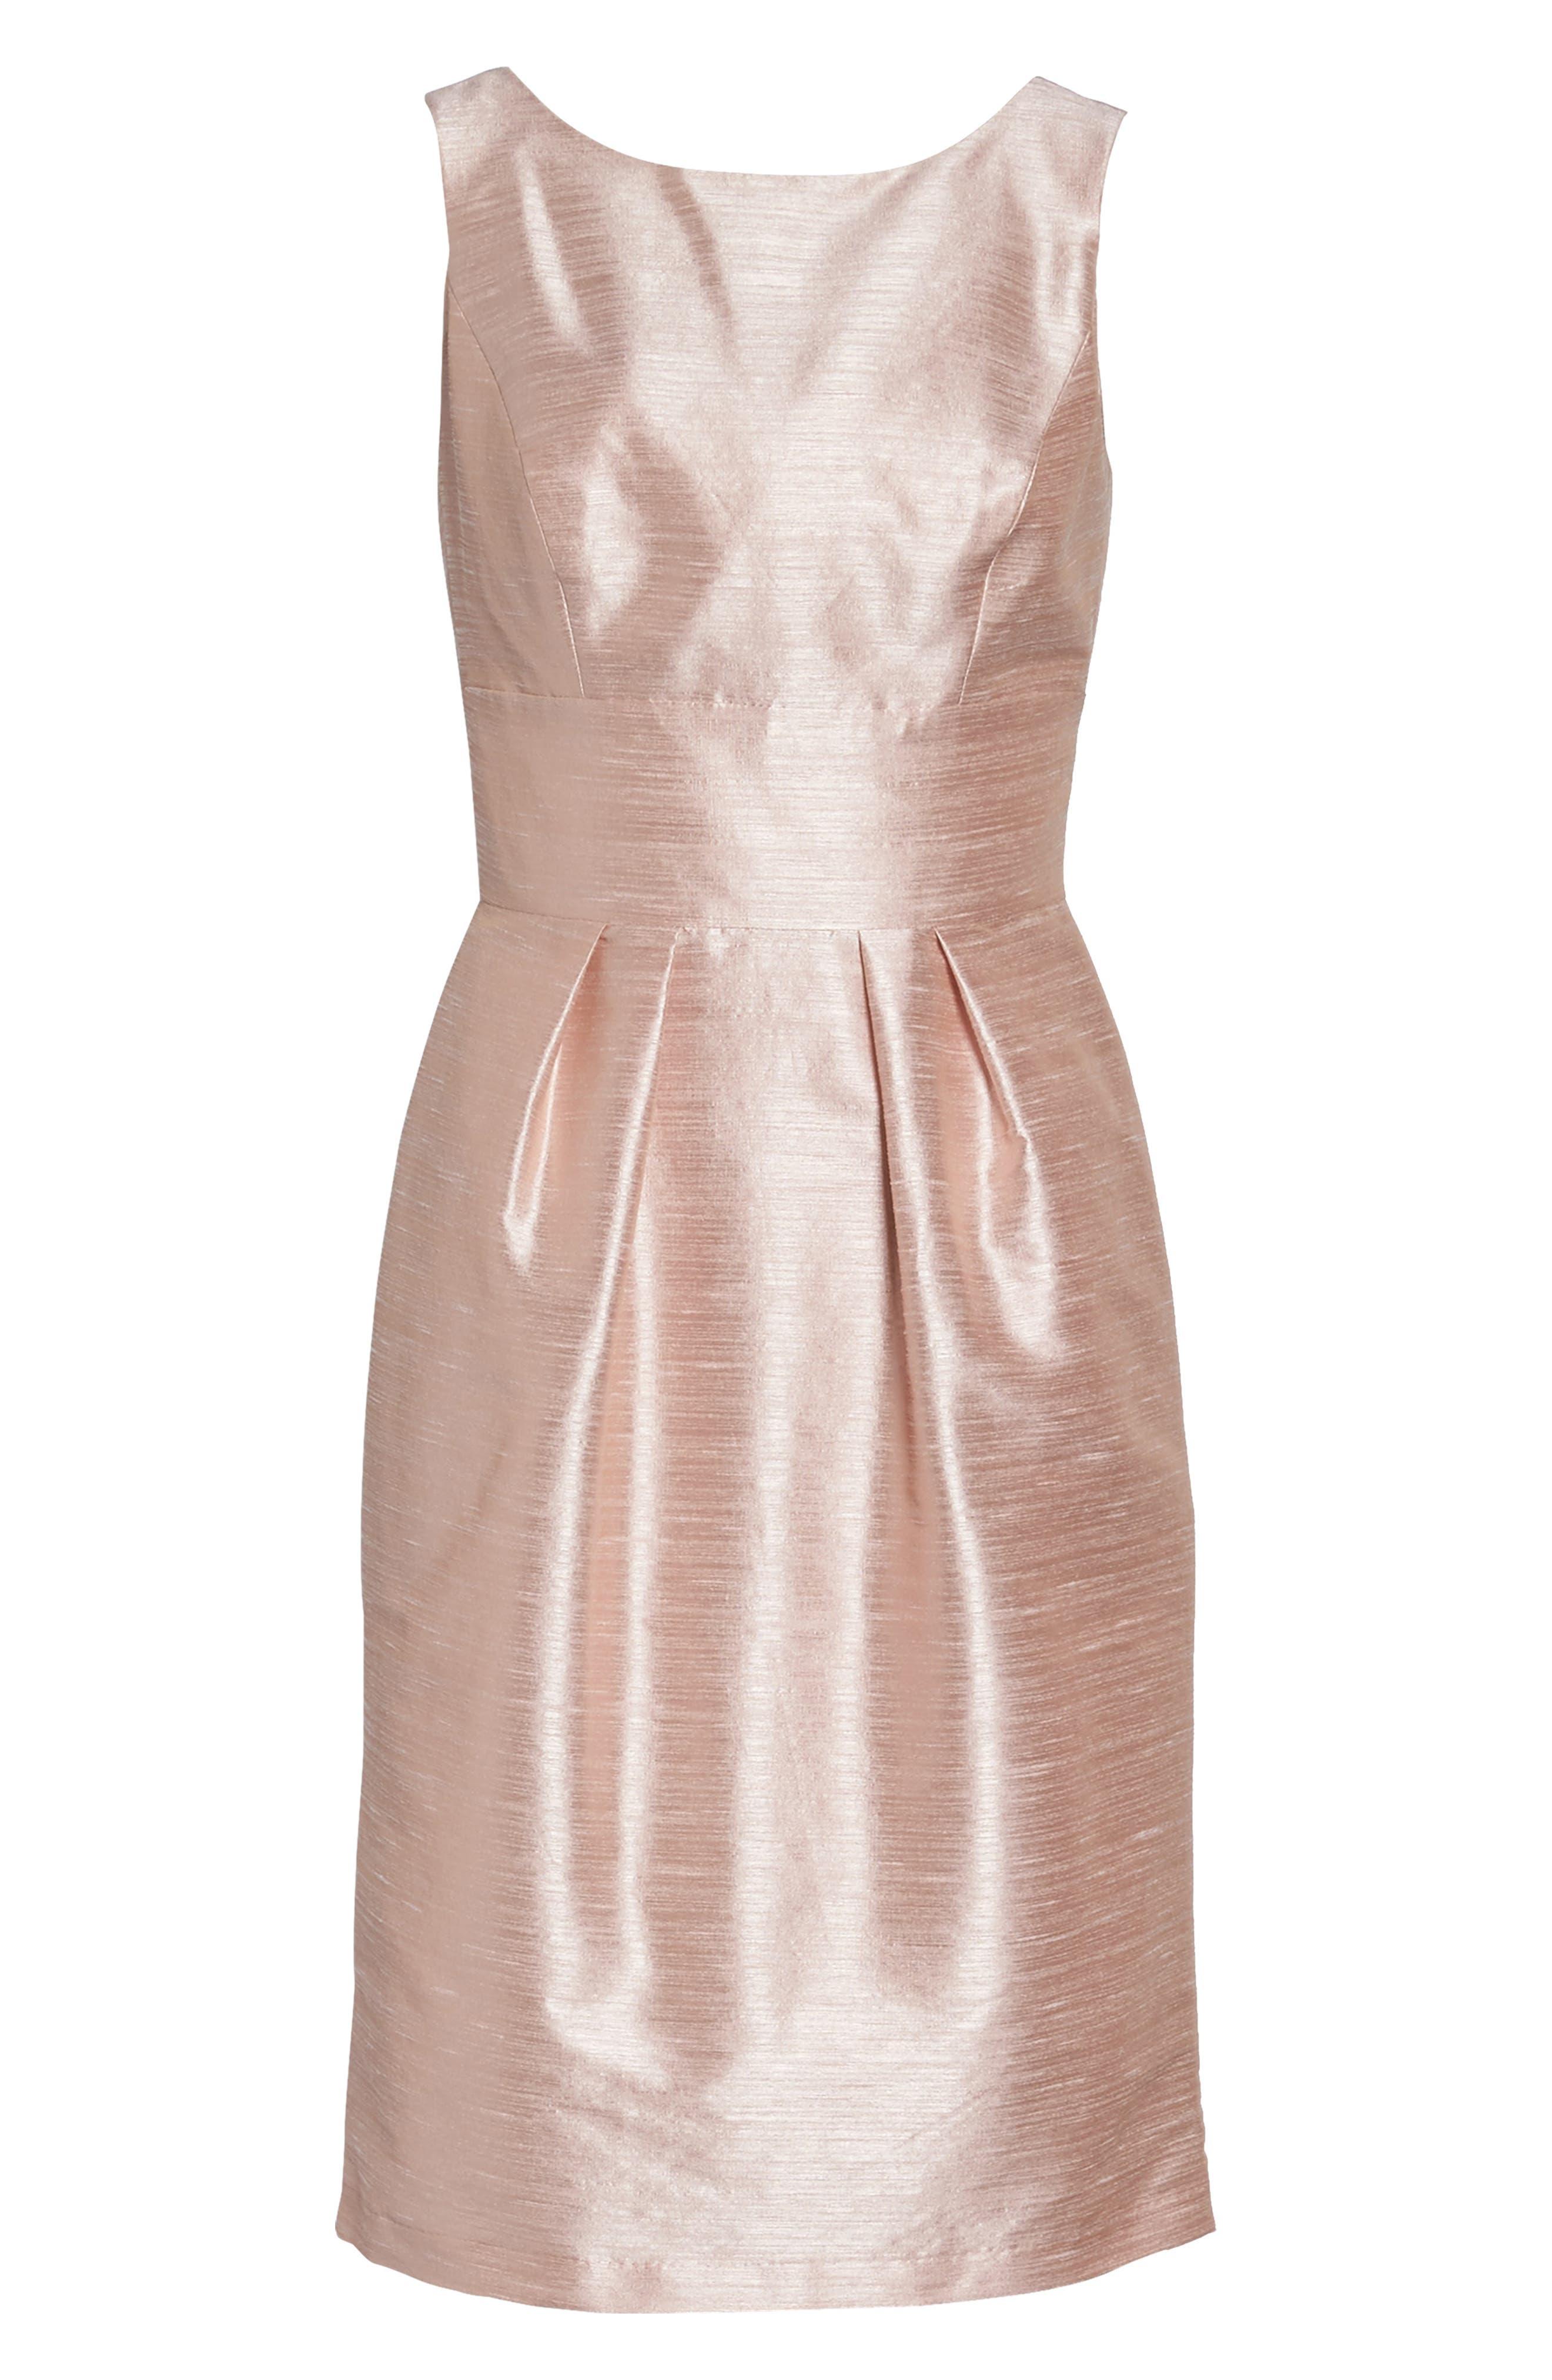 Boatneck Sheath Dress,                             Alternate thumbnail 8, color,                             689